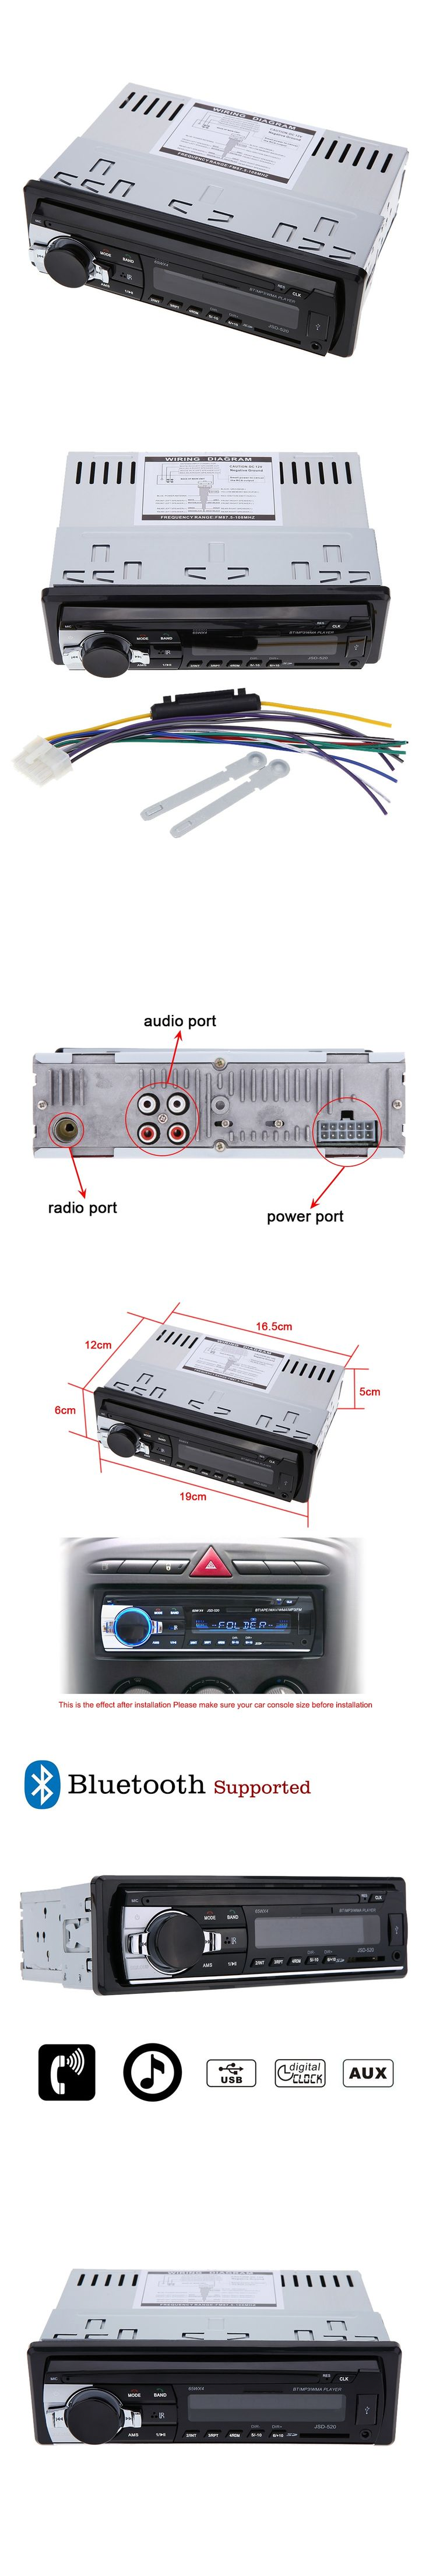 Nett Stereo Lautsprecherkabelfarben Ideen - Elektrische Schaltplan ...